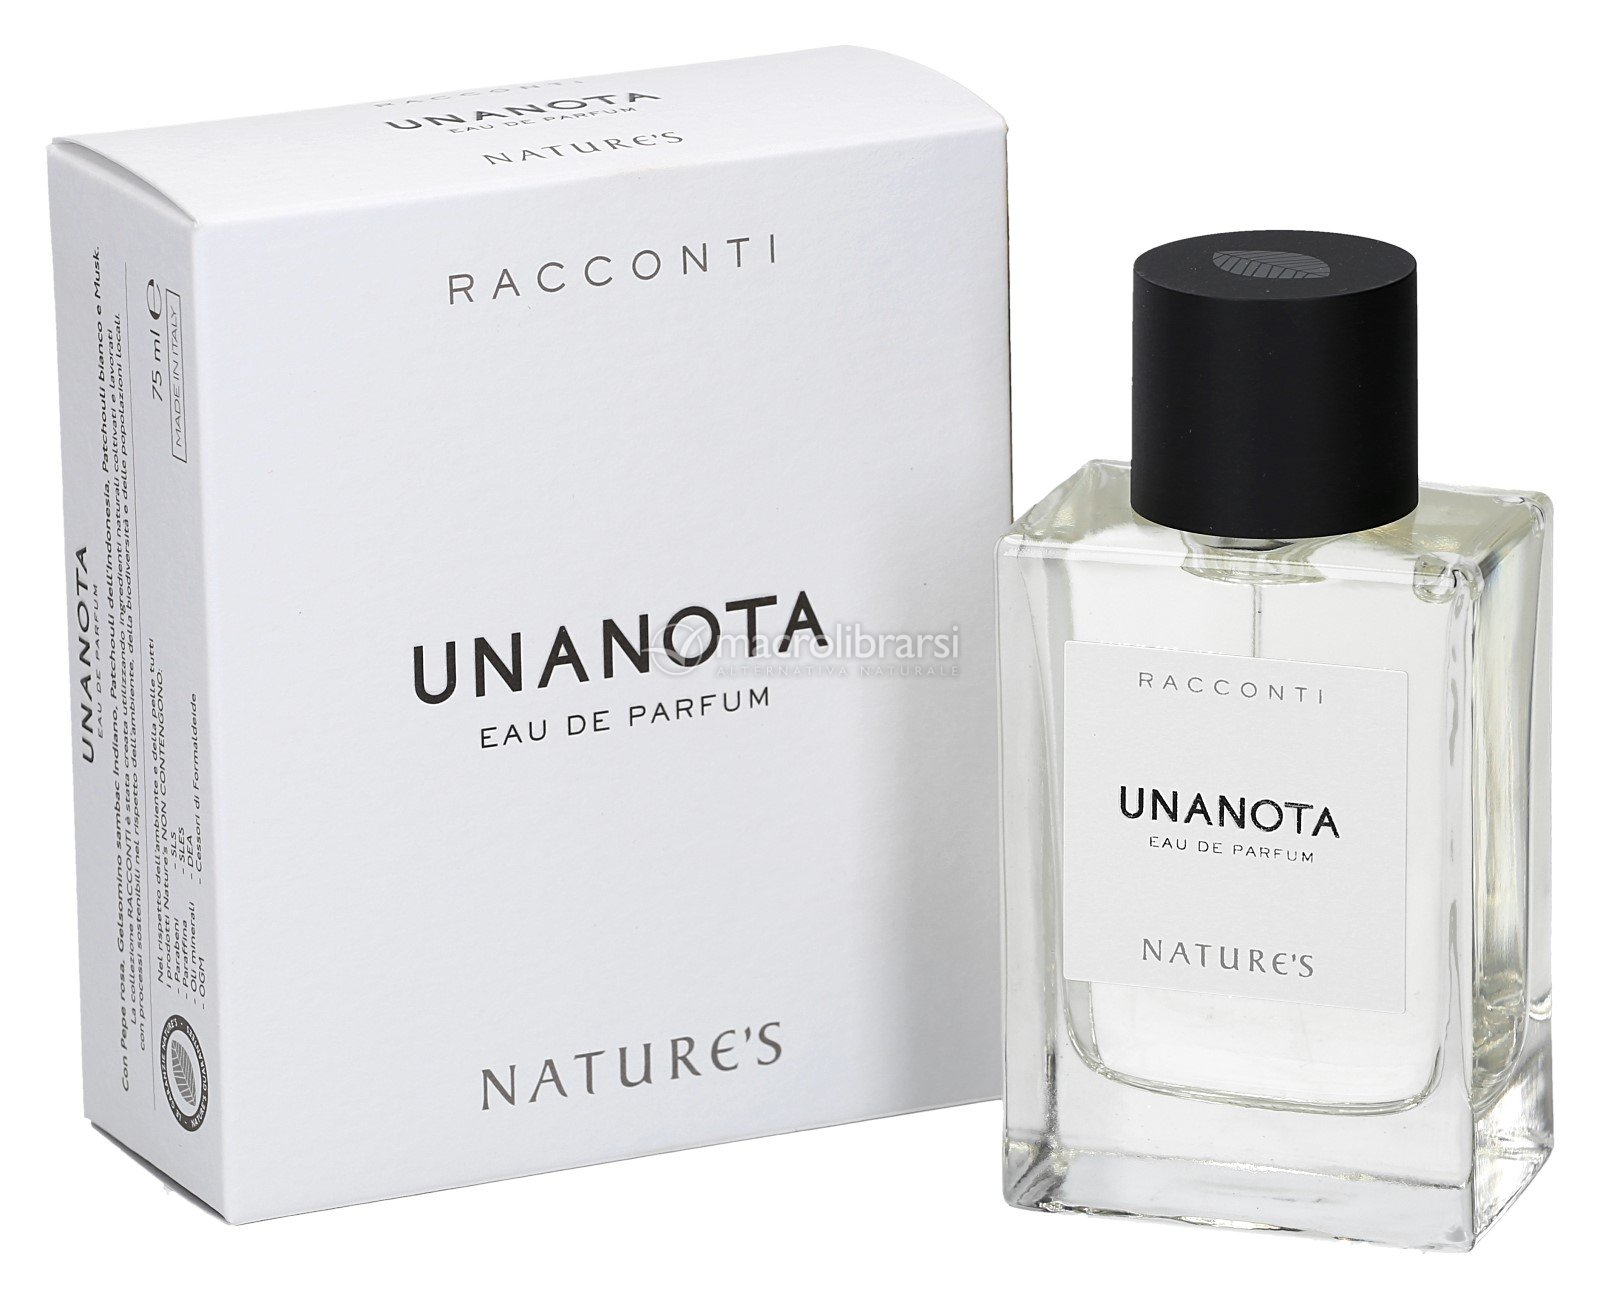 Unanota Eau De Parfum Fragranza Speziata Di Natures